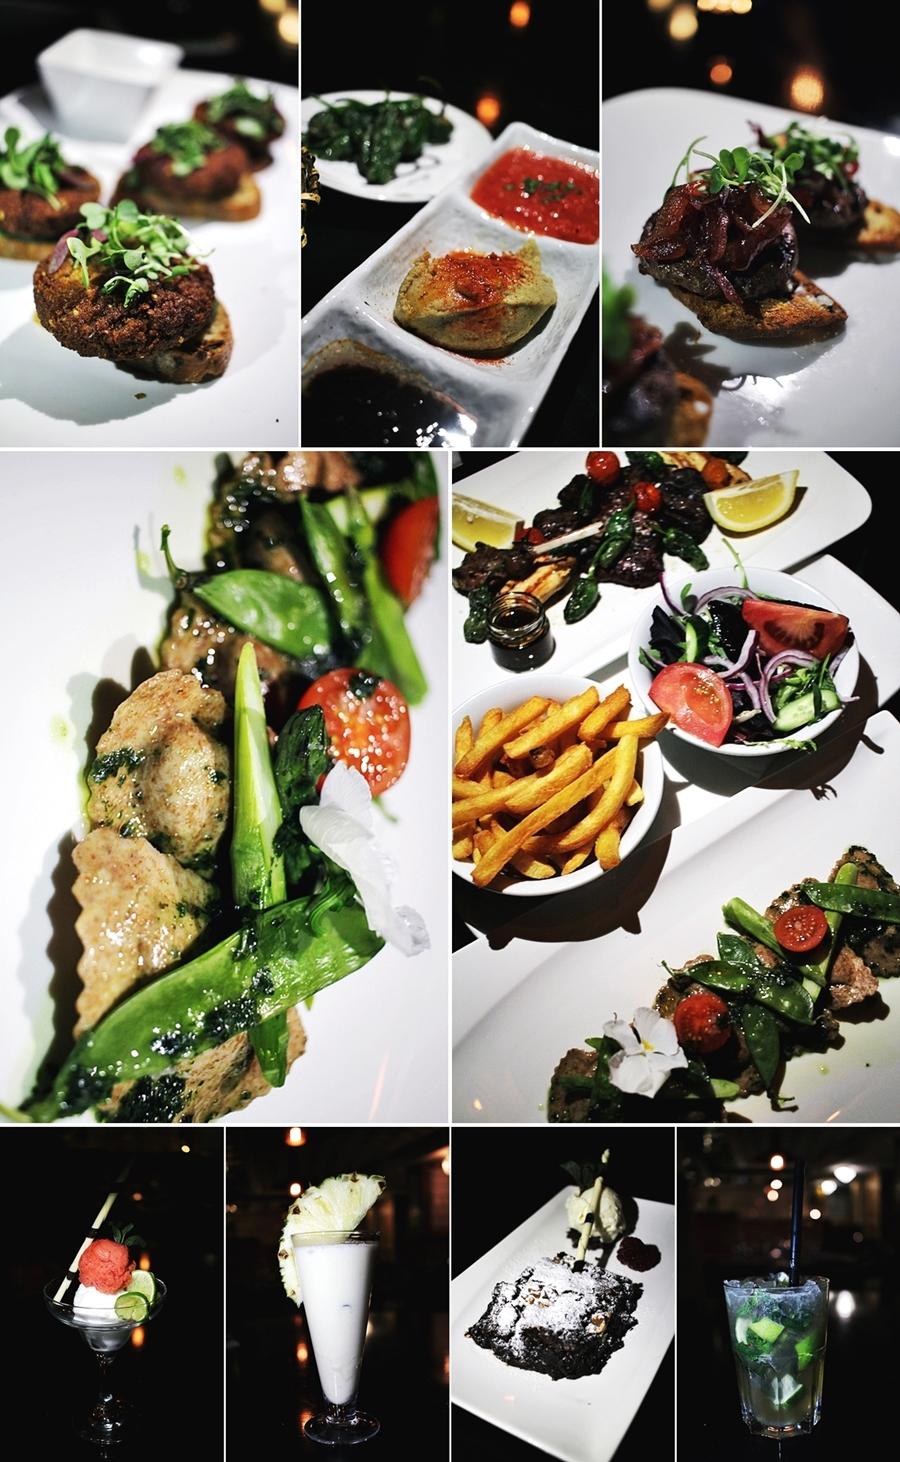 palma hotel cort restaurant food